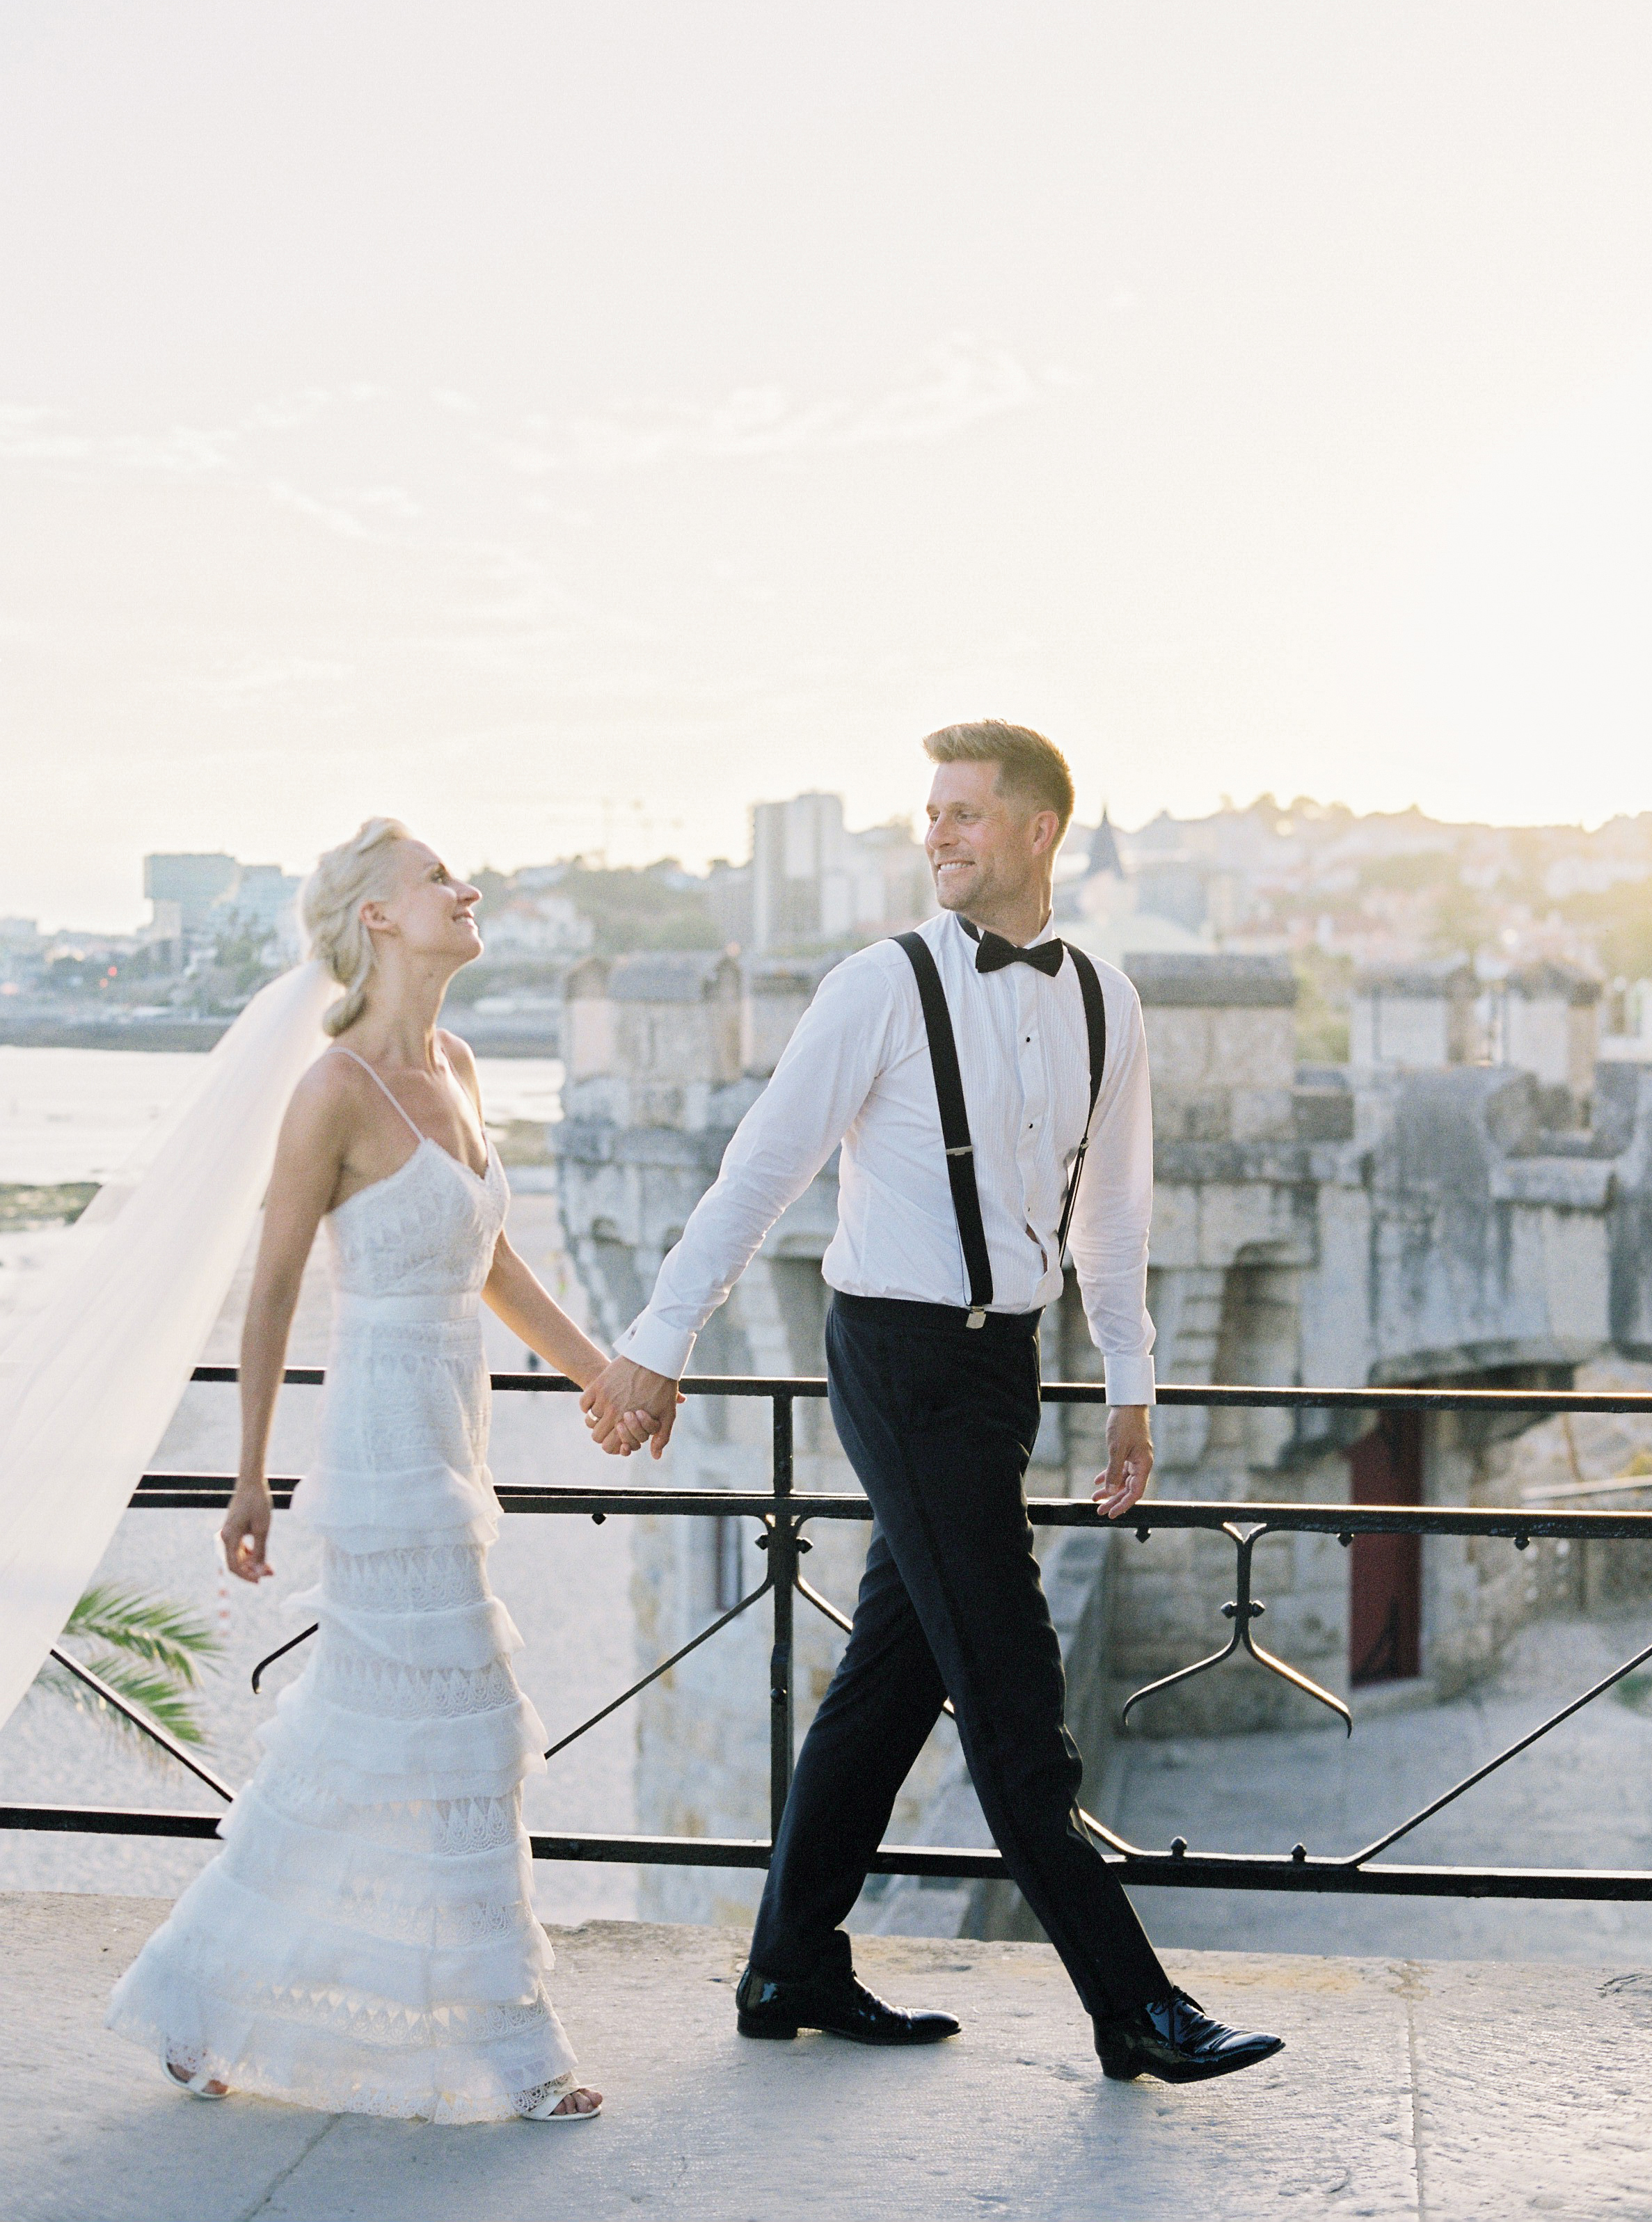 Nastia_Vesna_Photography_Wedding_Portugal_48.jpg